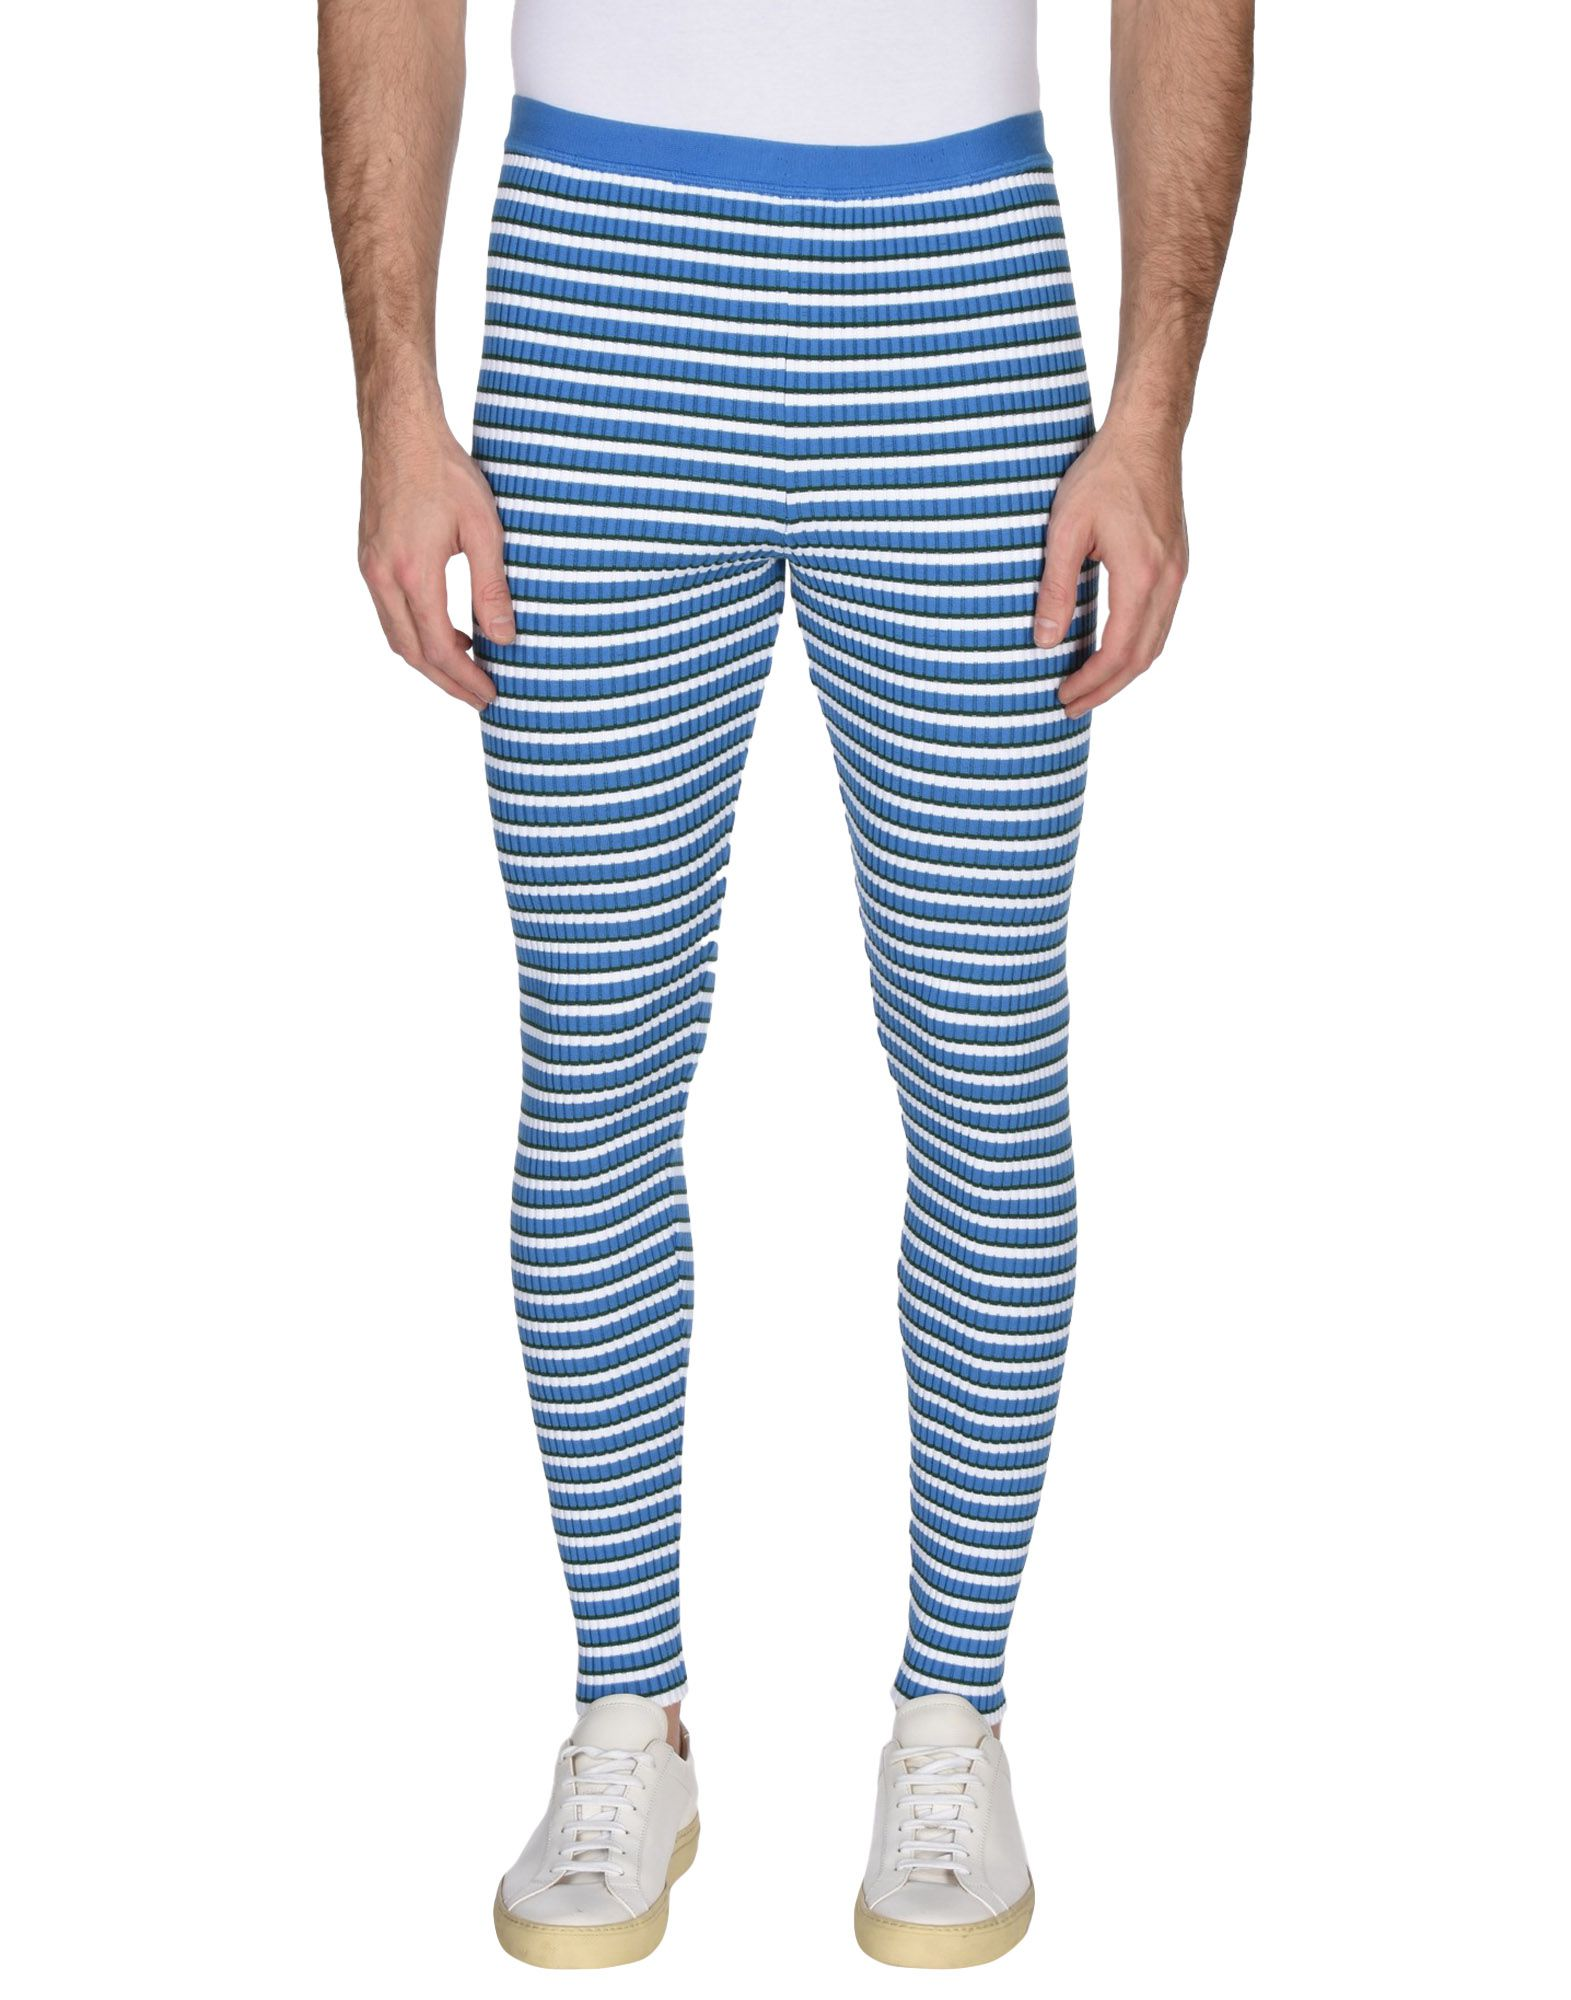 Pantalone Msgm Uomo - Acquista online su